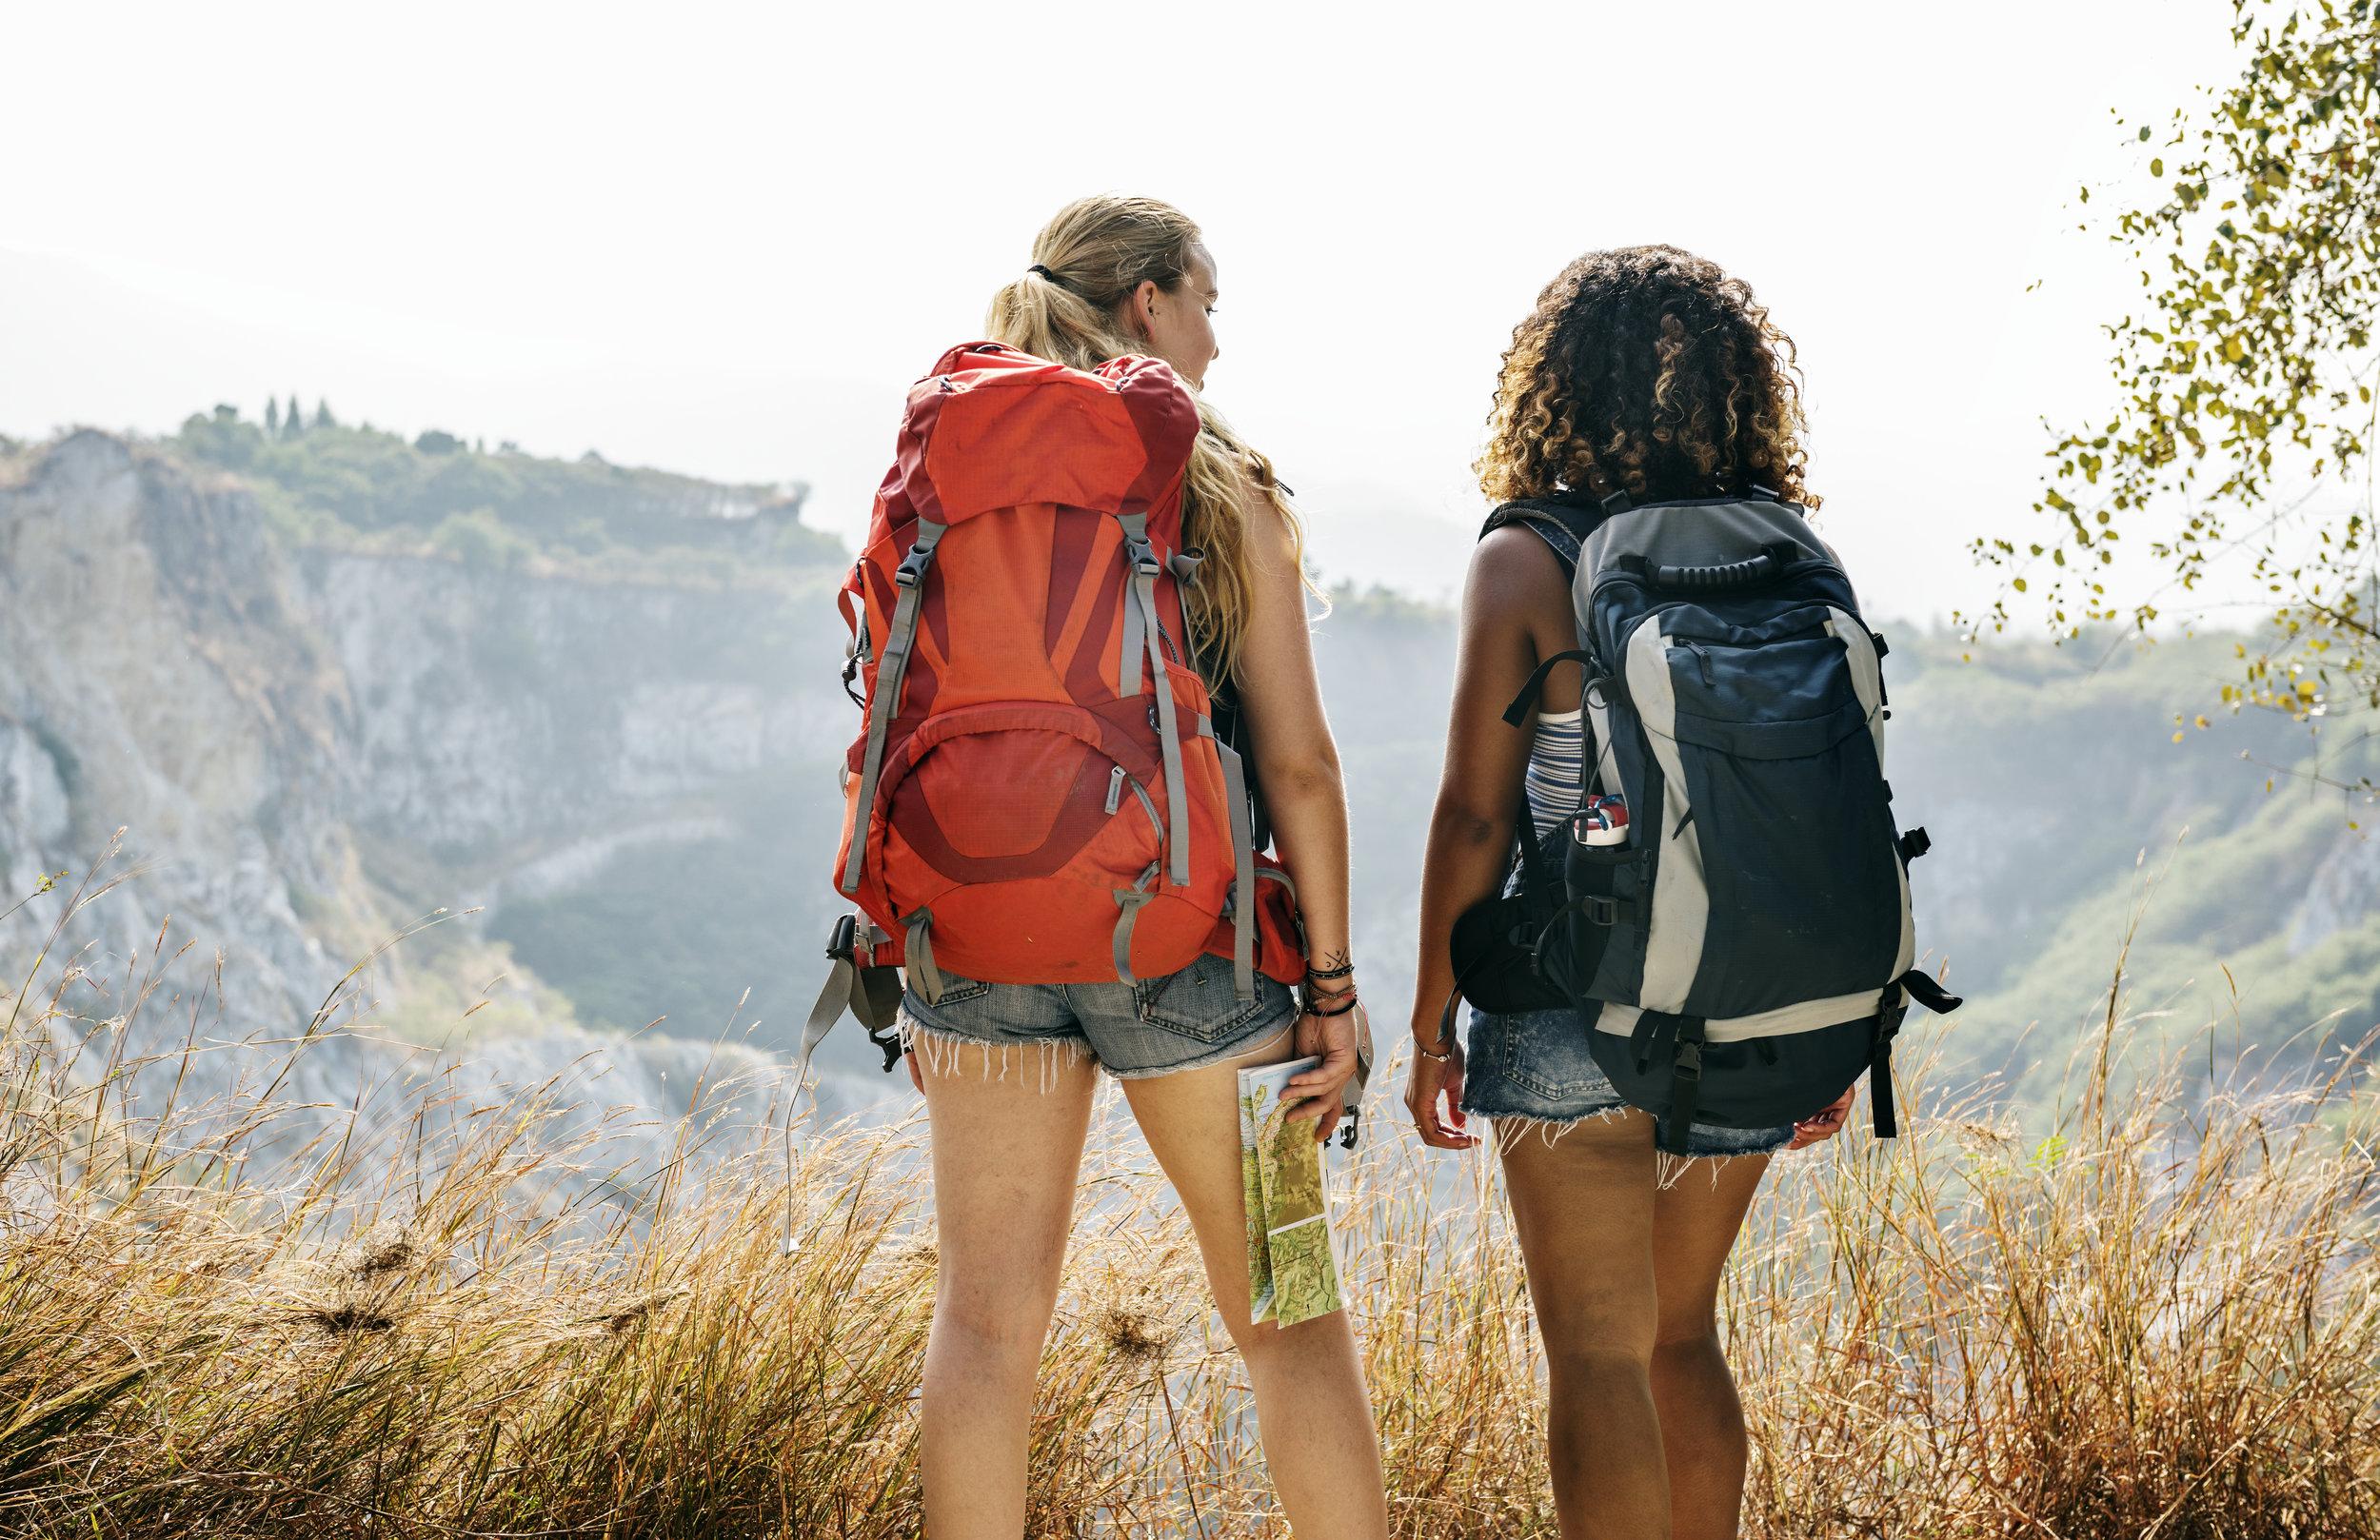 Girls hike together